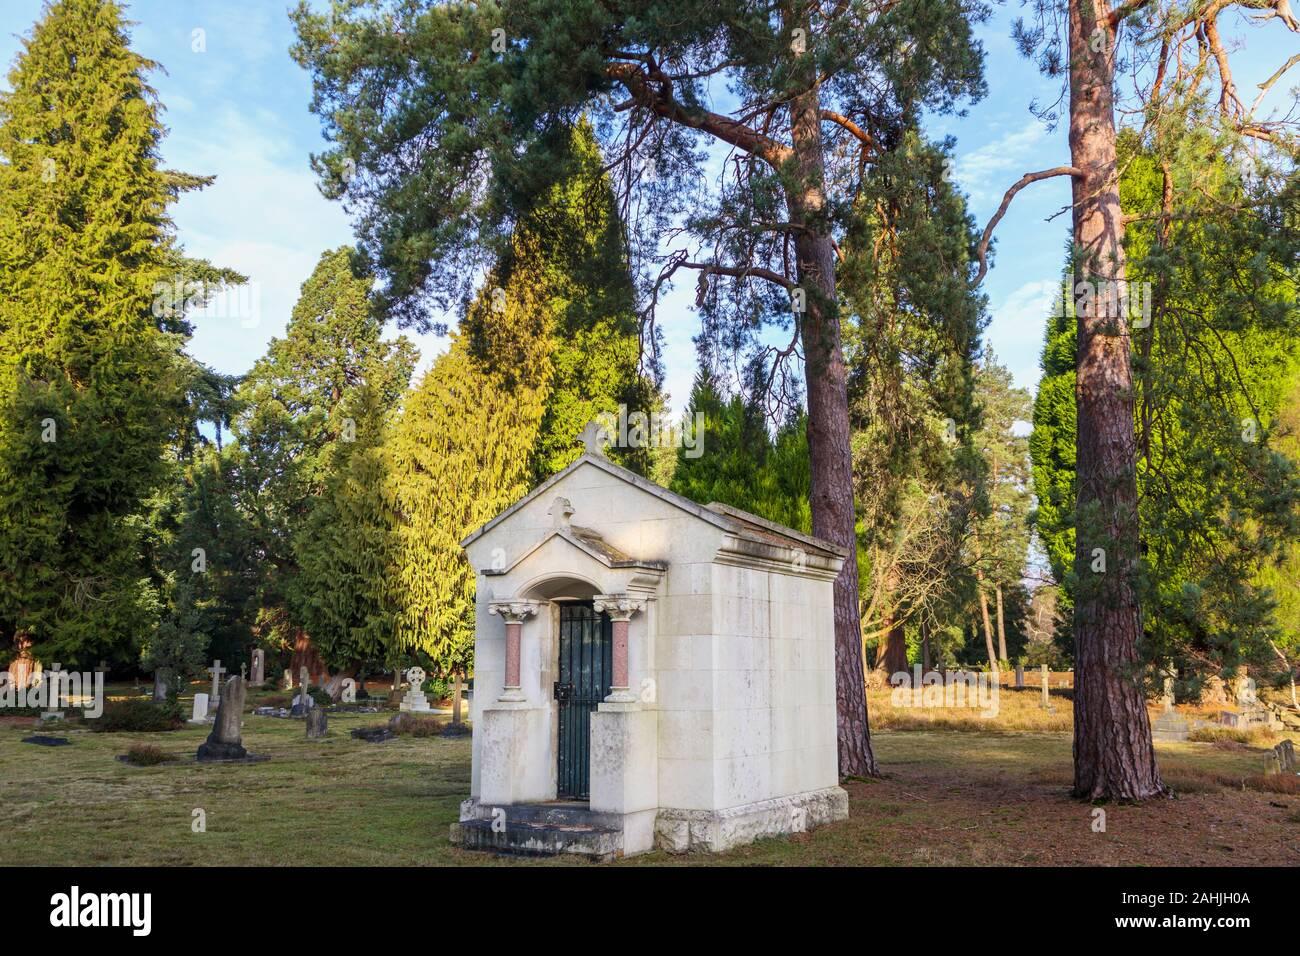 The small Montagu-Winch Mausoleum in South Cemetery, Brookwood Cemetery, Cemetery Pales, Brookwood, near Woking, Surrey, southeast England, UK Stock Photo